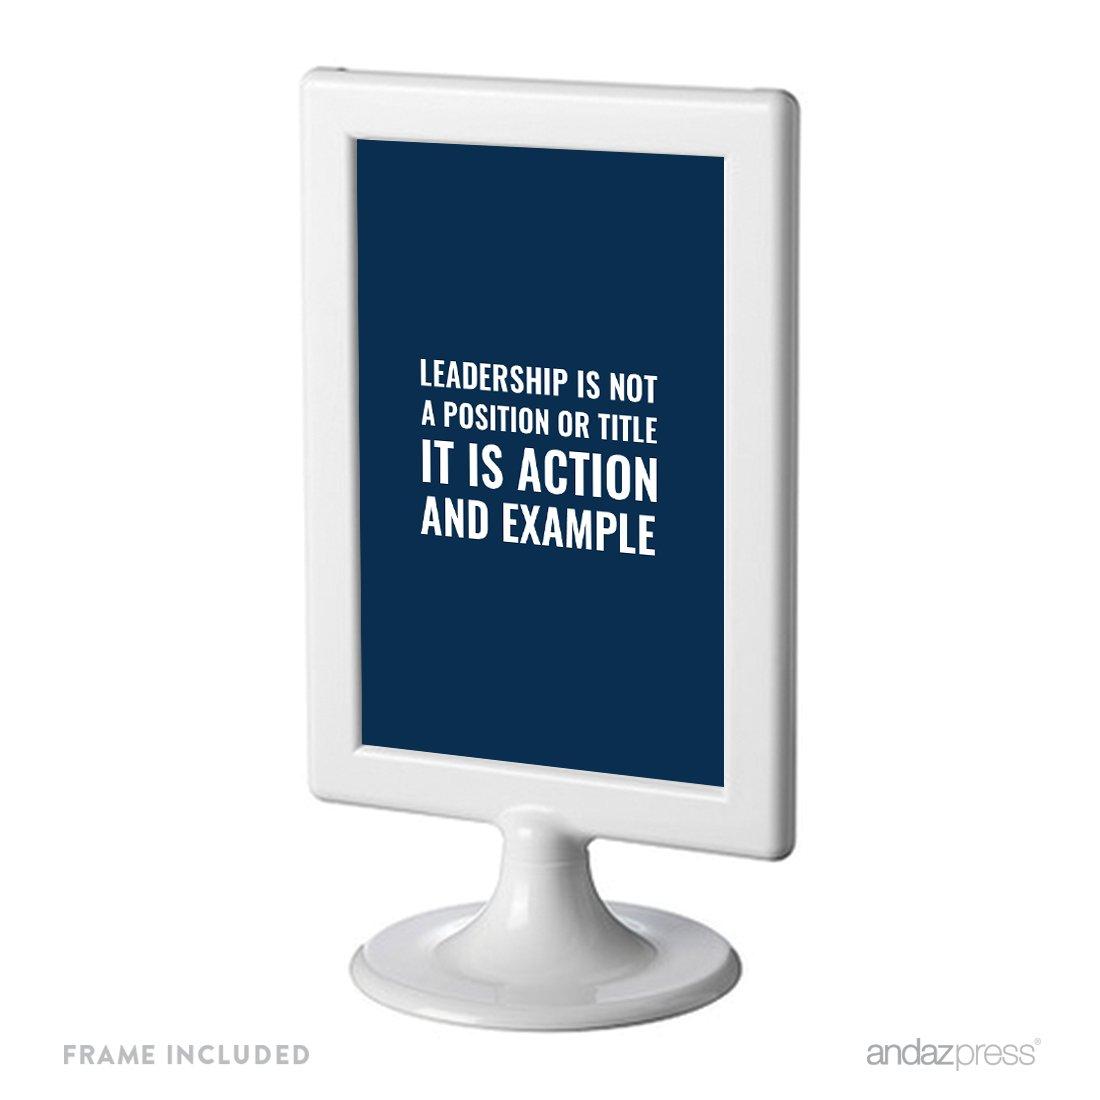 Andaz Press Office Framed Desk Art, Leadership is